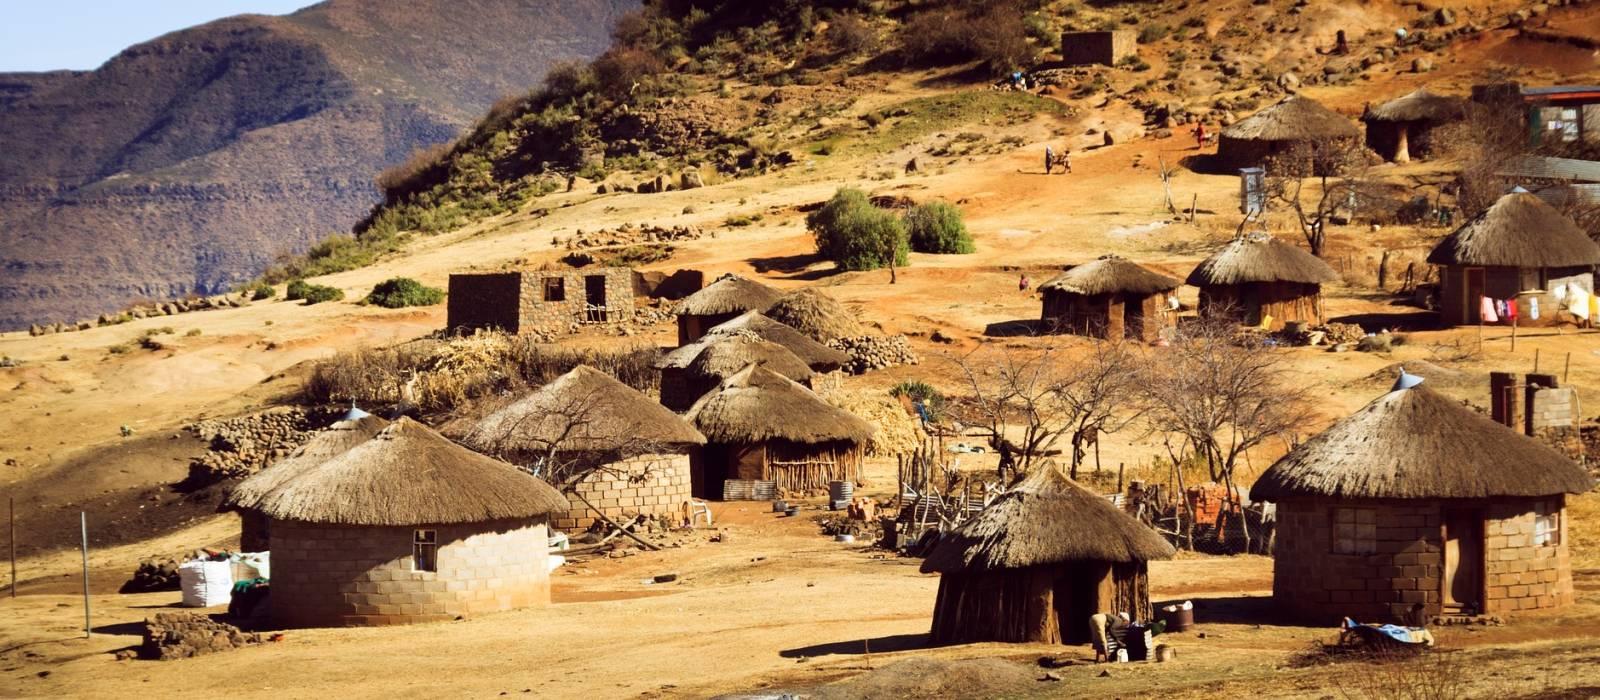 Road Trip: Lesotho's Mountain Kingdom and the Wild Coast Tour Trip 1